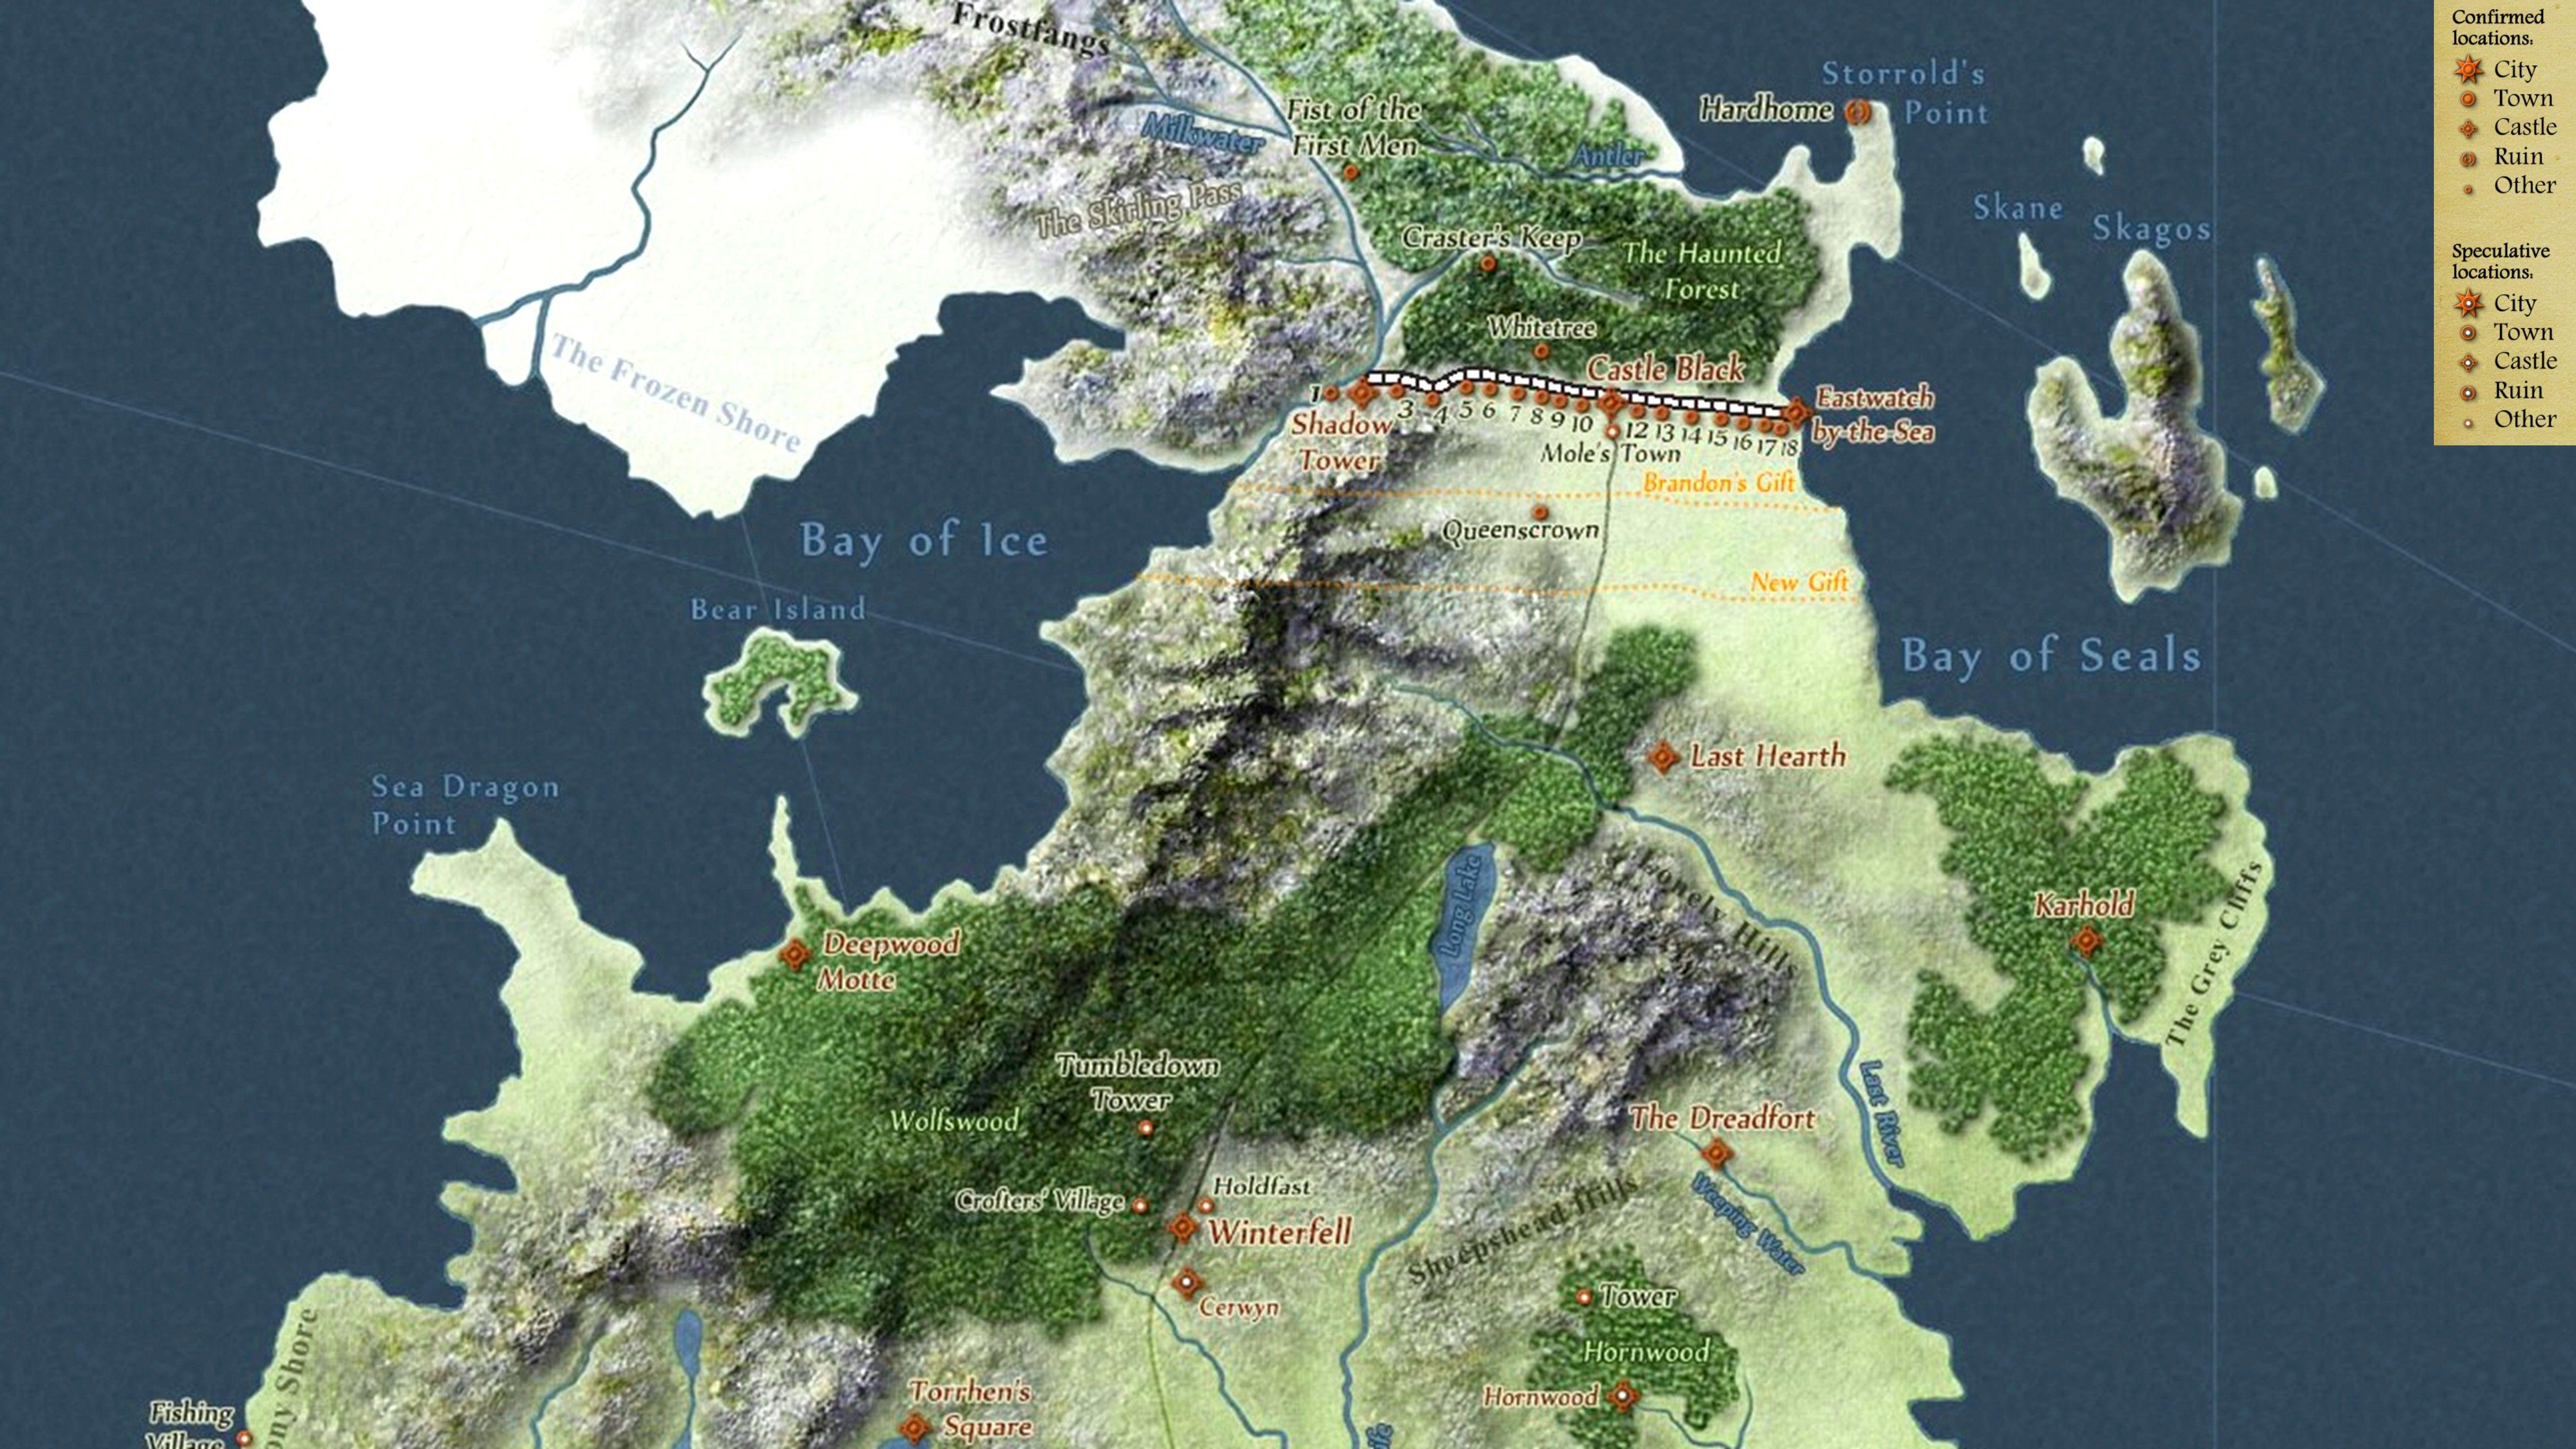 Got Karte Westeros.Game Of Thrones Westeros Karte Deutsch